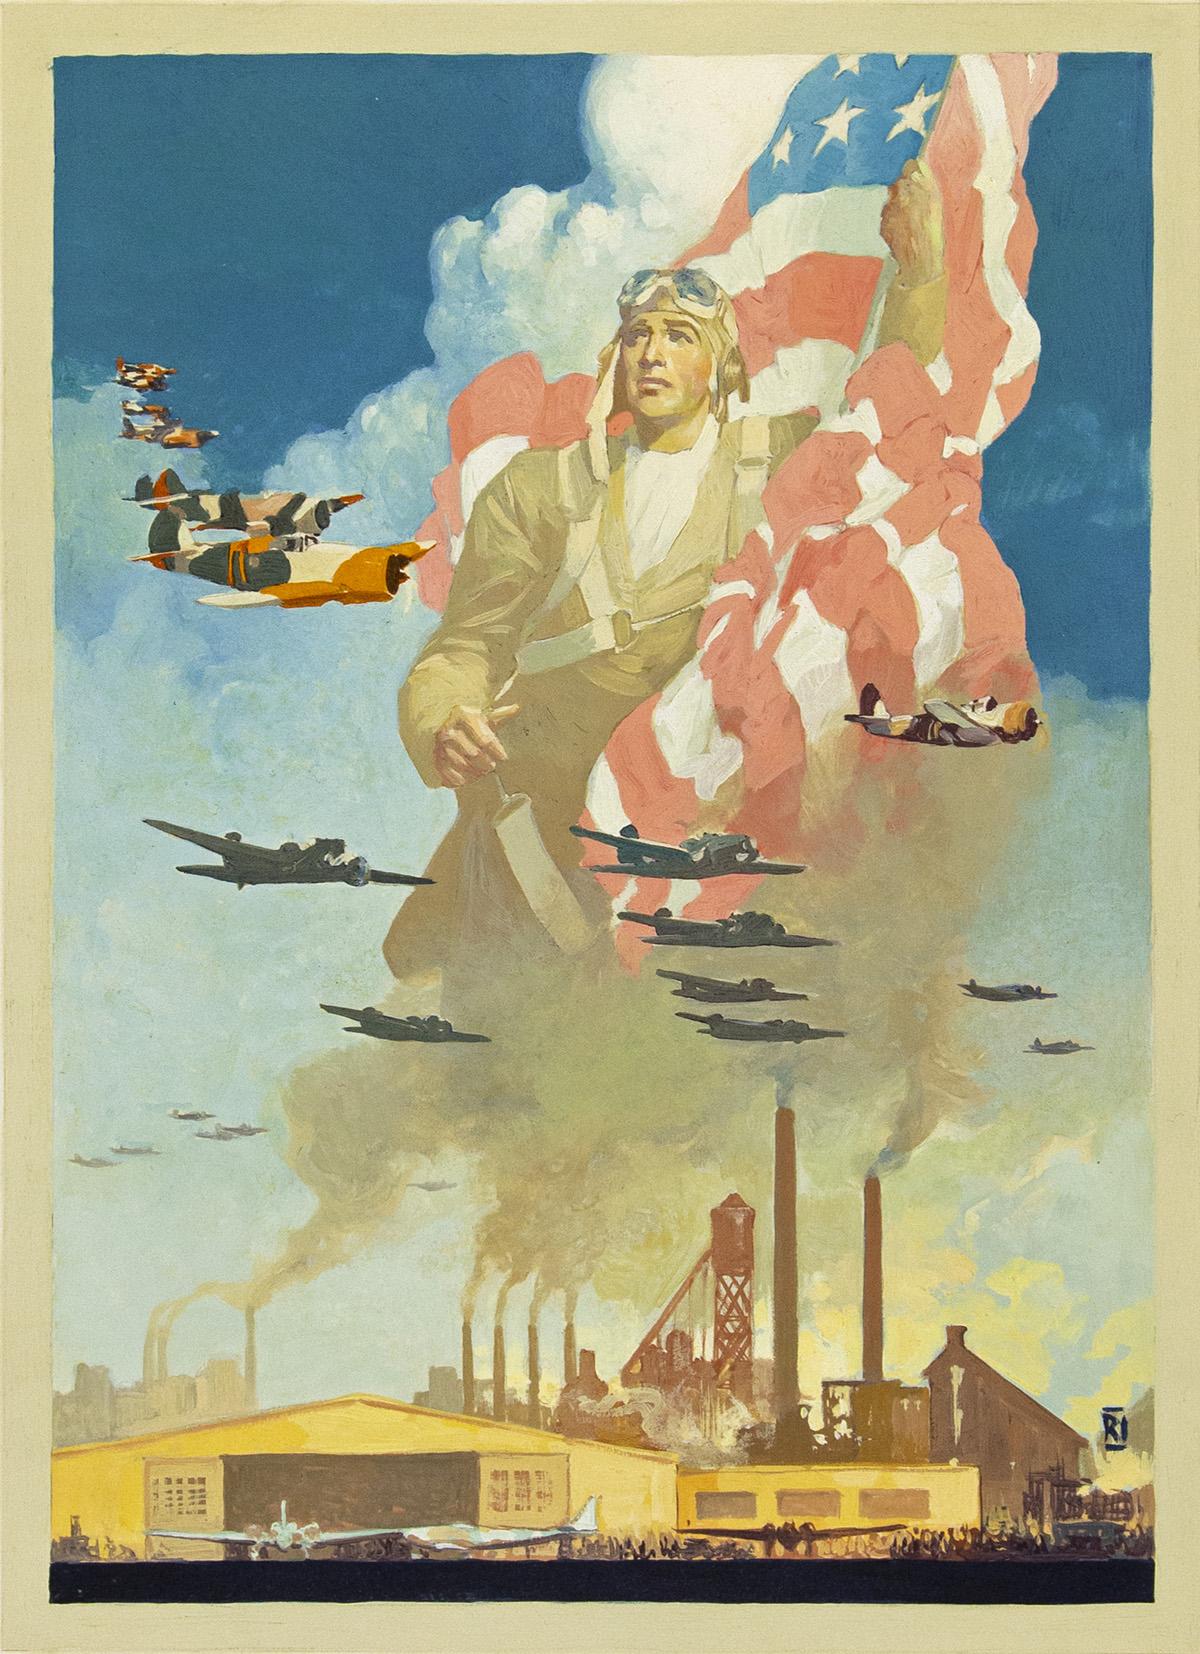 RALPH ILIGAN. Defense in the air begins on the ground. [WORLD WAR II / AIR FORCE / POSTER / PROPAGANDA]